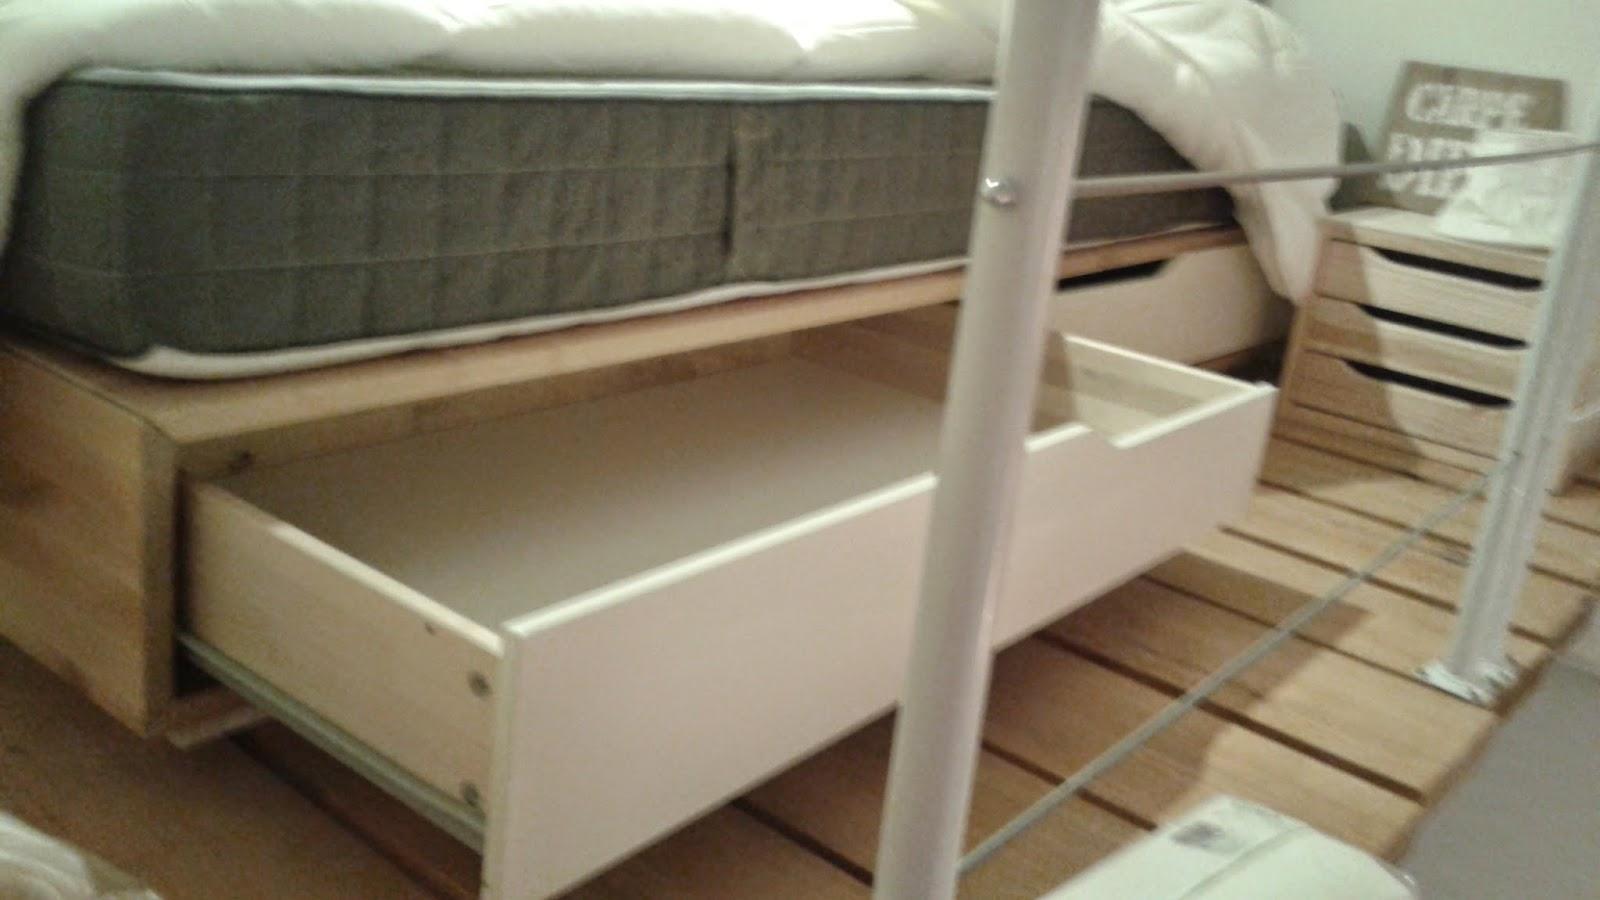 Camas con almacenaje ikea interesting cama somier for Cajones bajo cama ikea